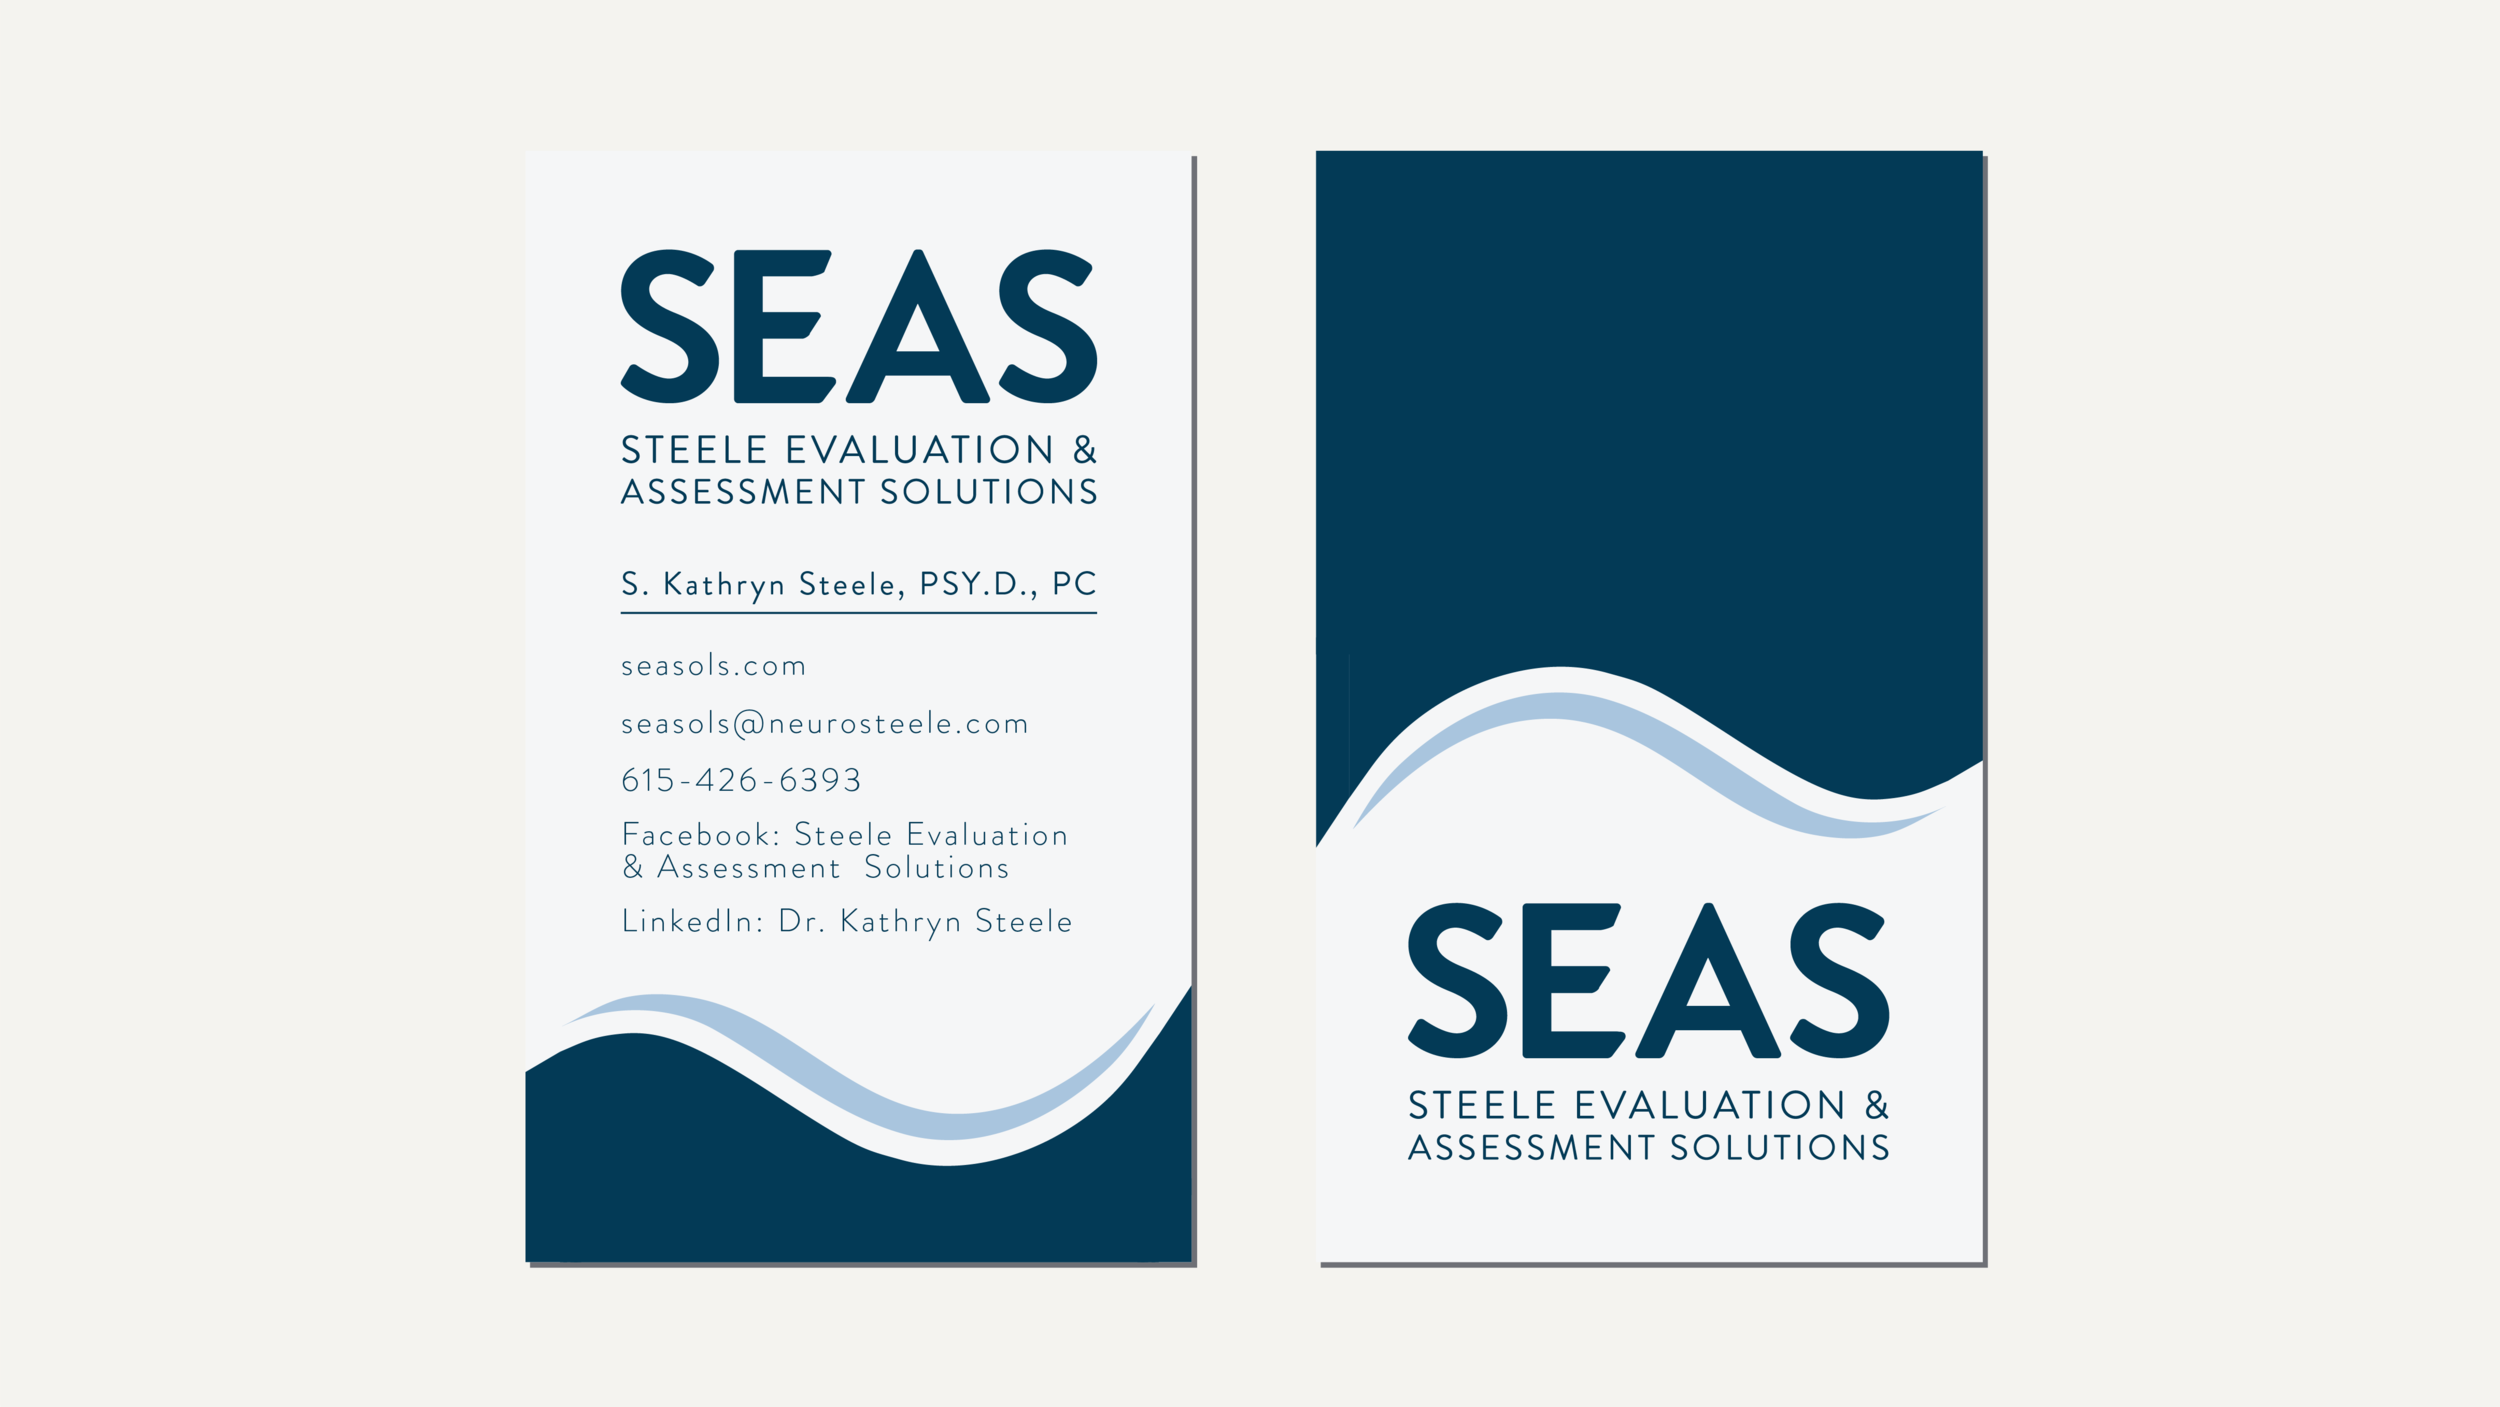 SEAS_Portfolioai_LogoSubmarks.png